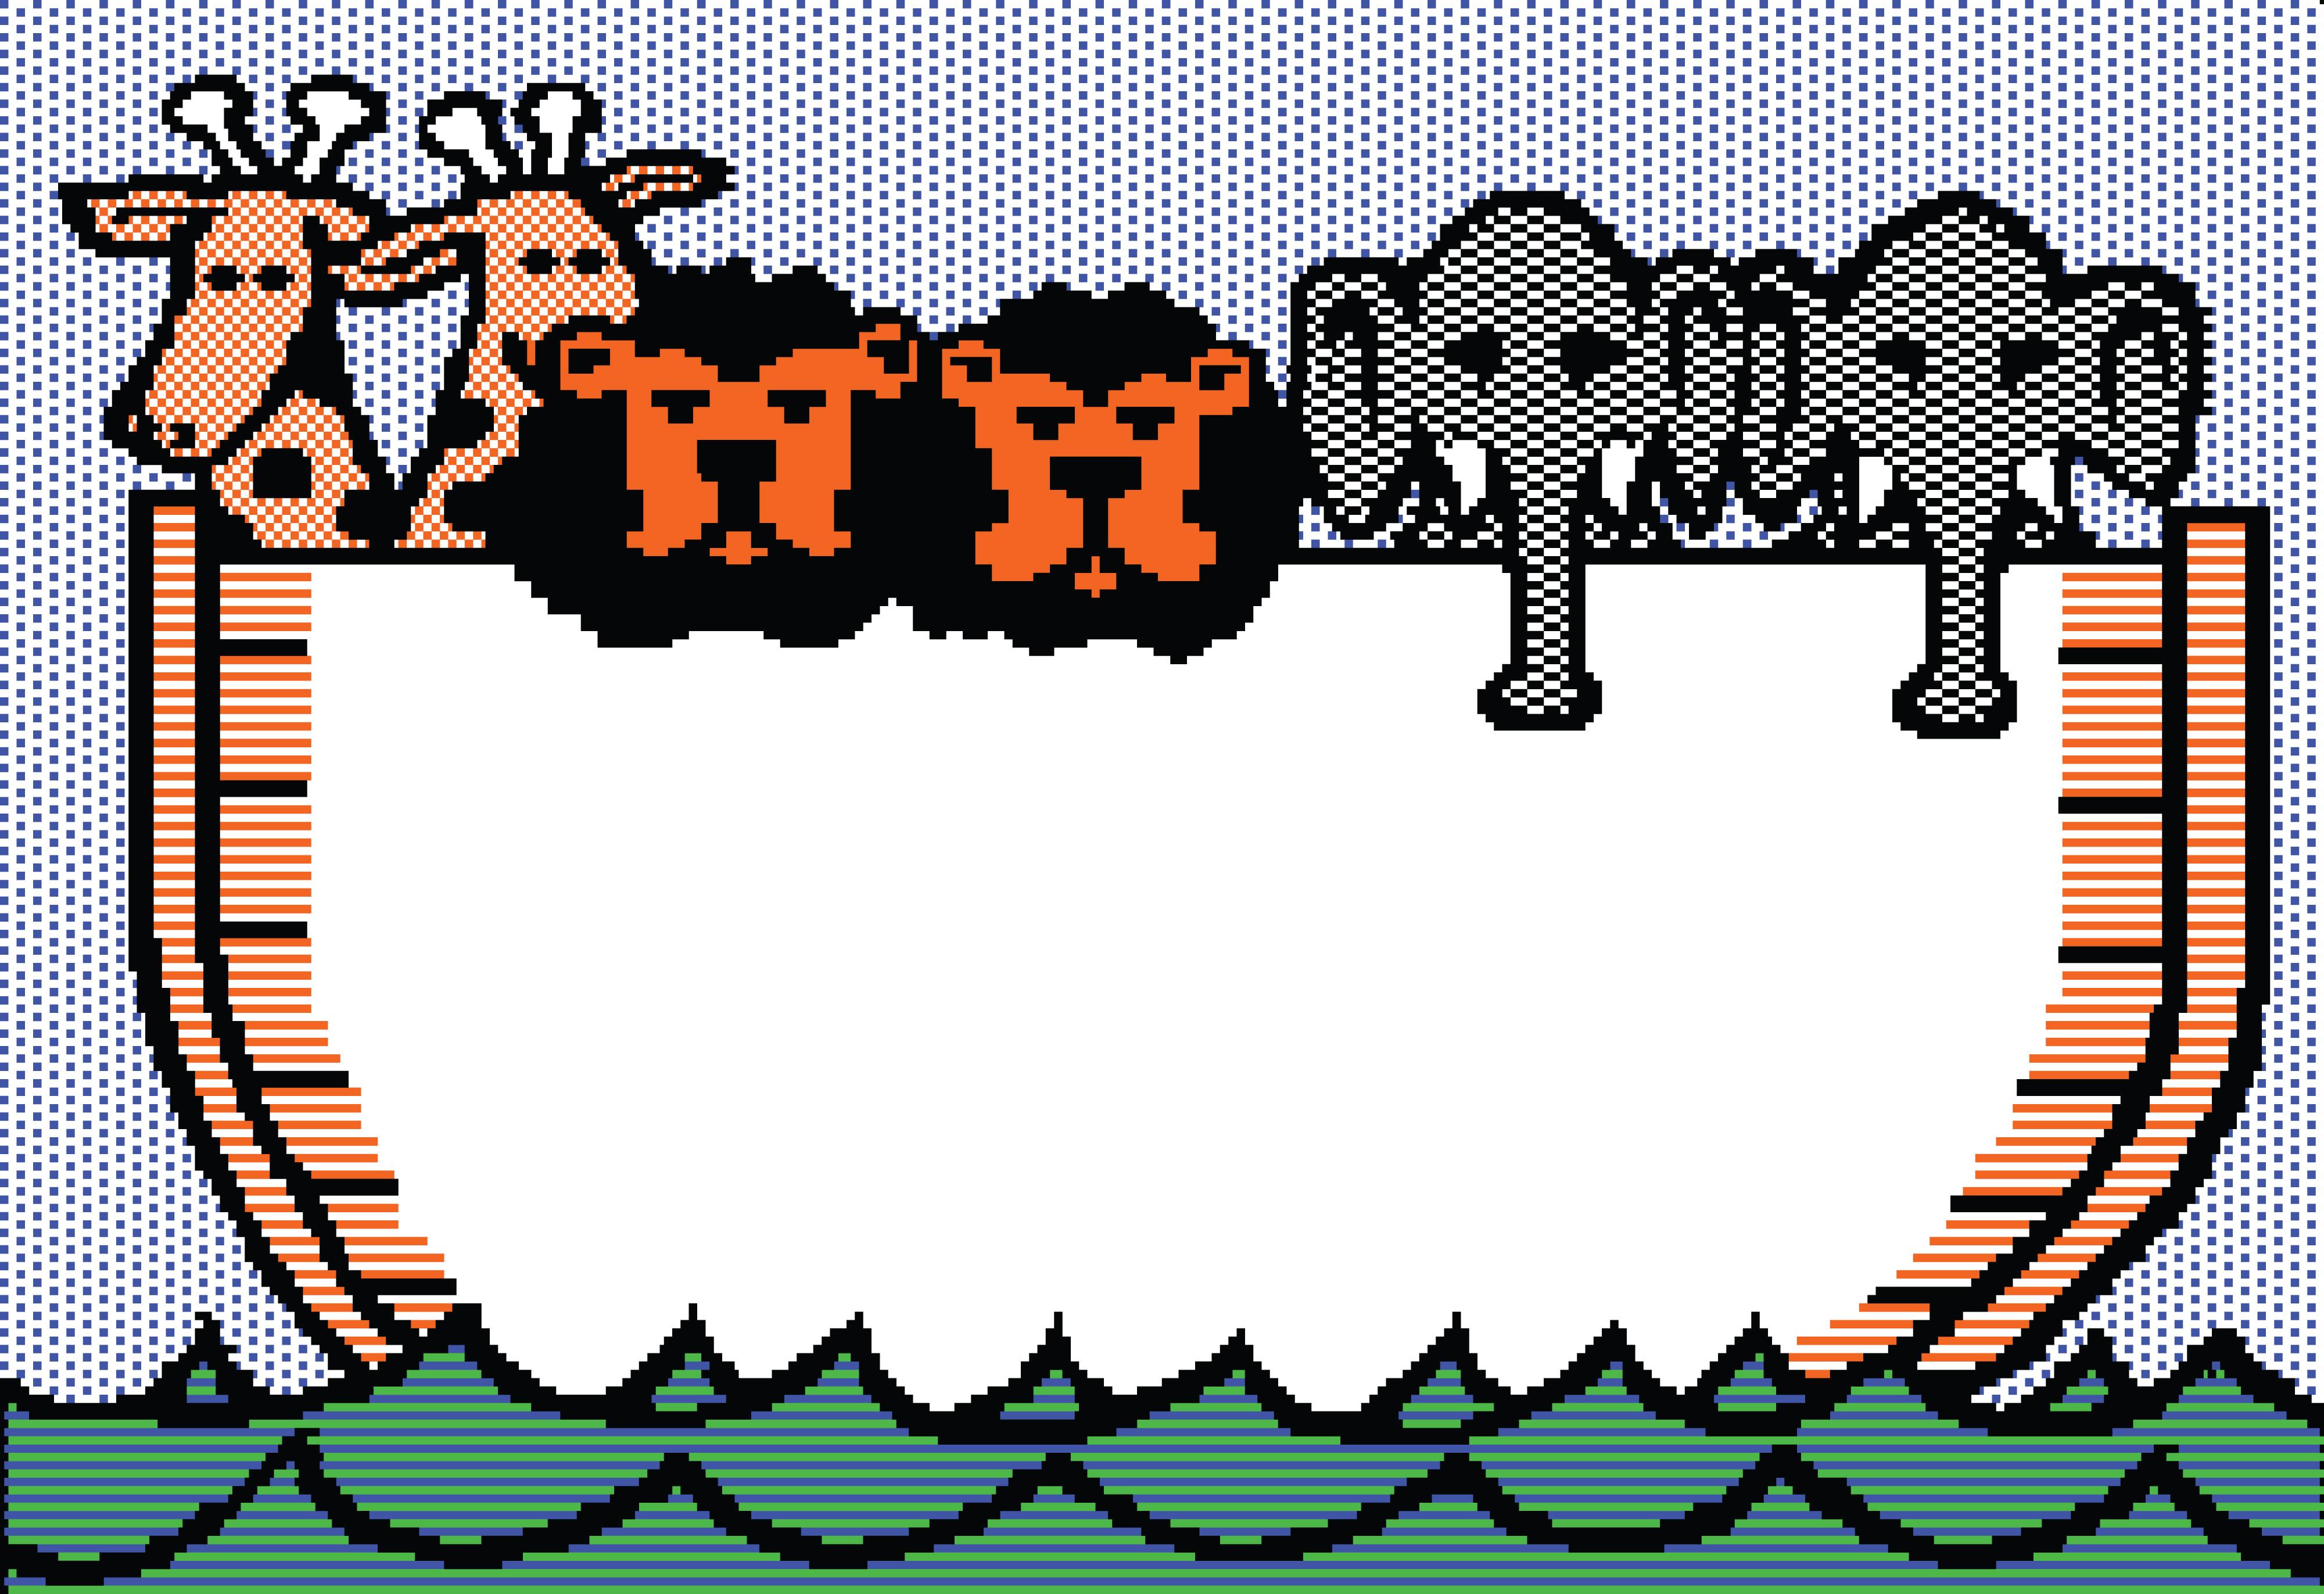 4000x2743 Free Clipart Of A Noahs Ark Beagle Screen With Giraffes, Lions